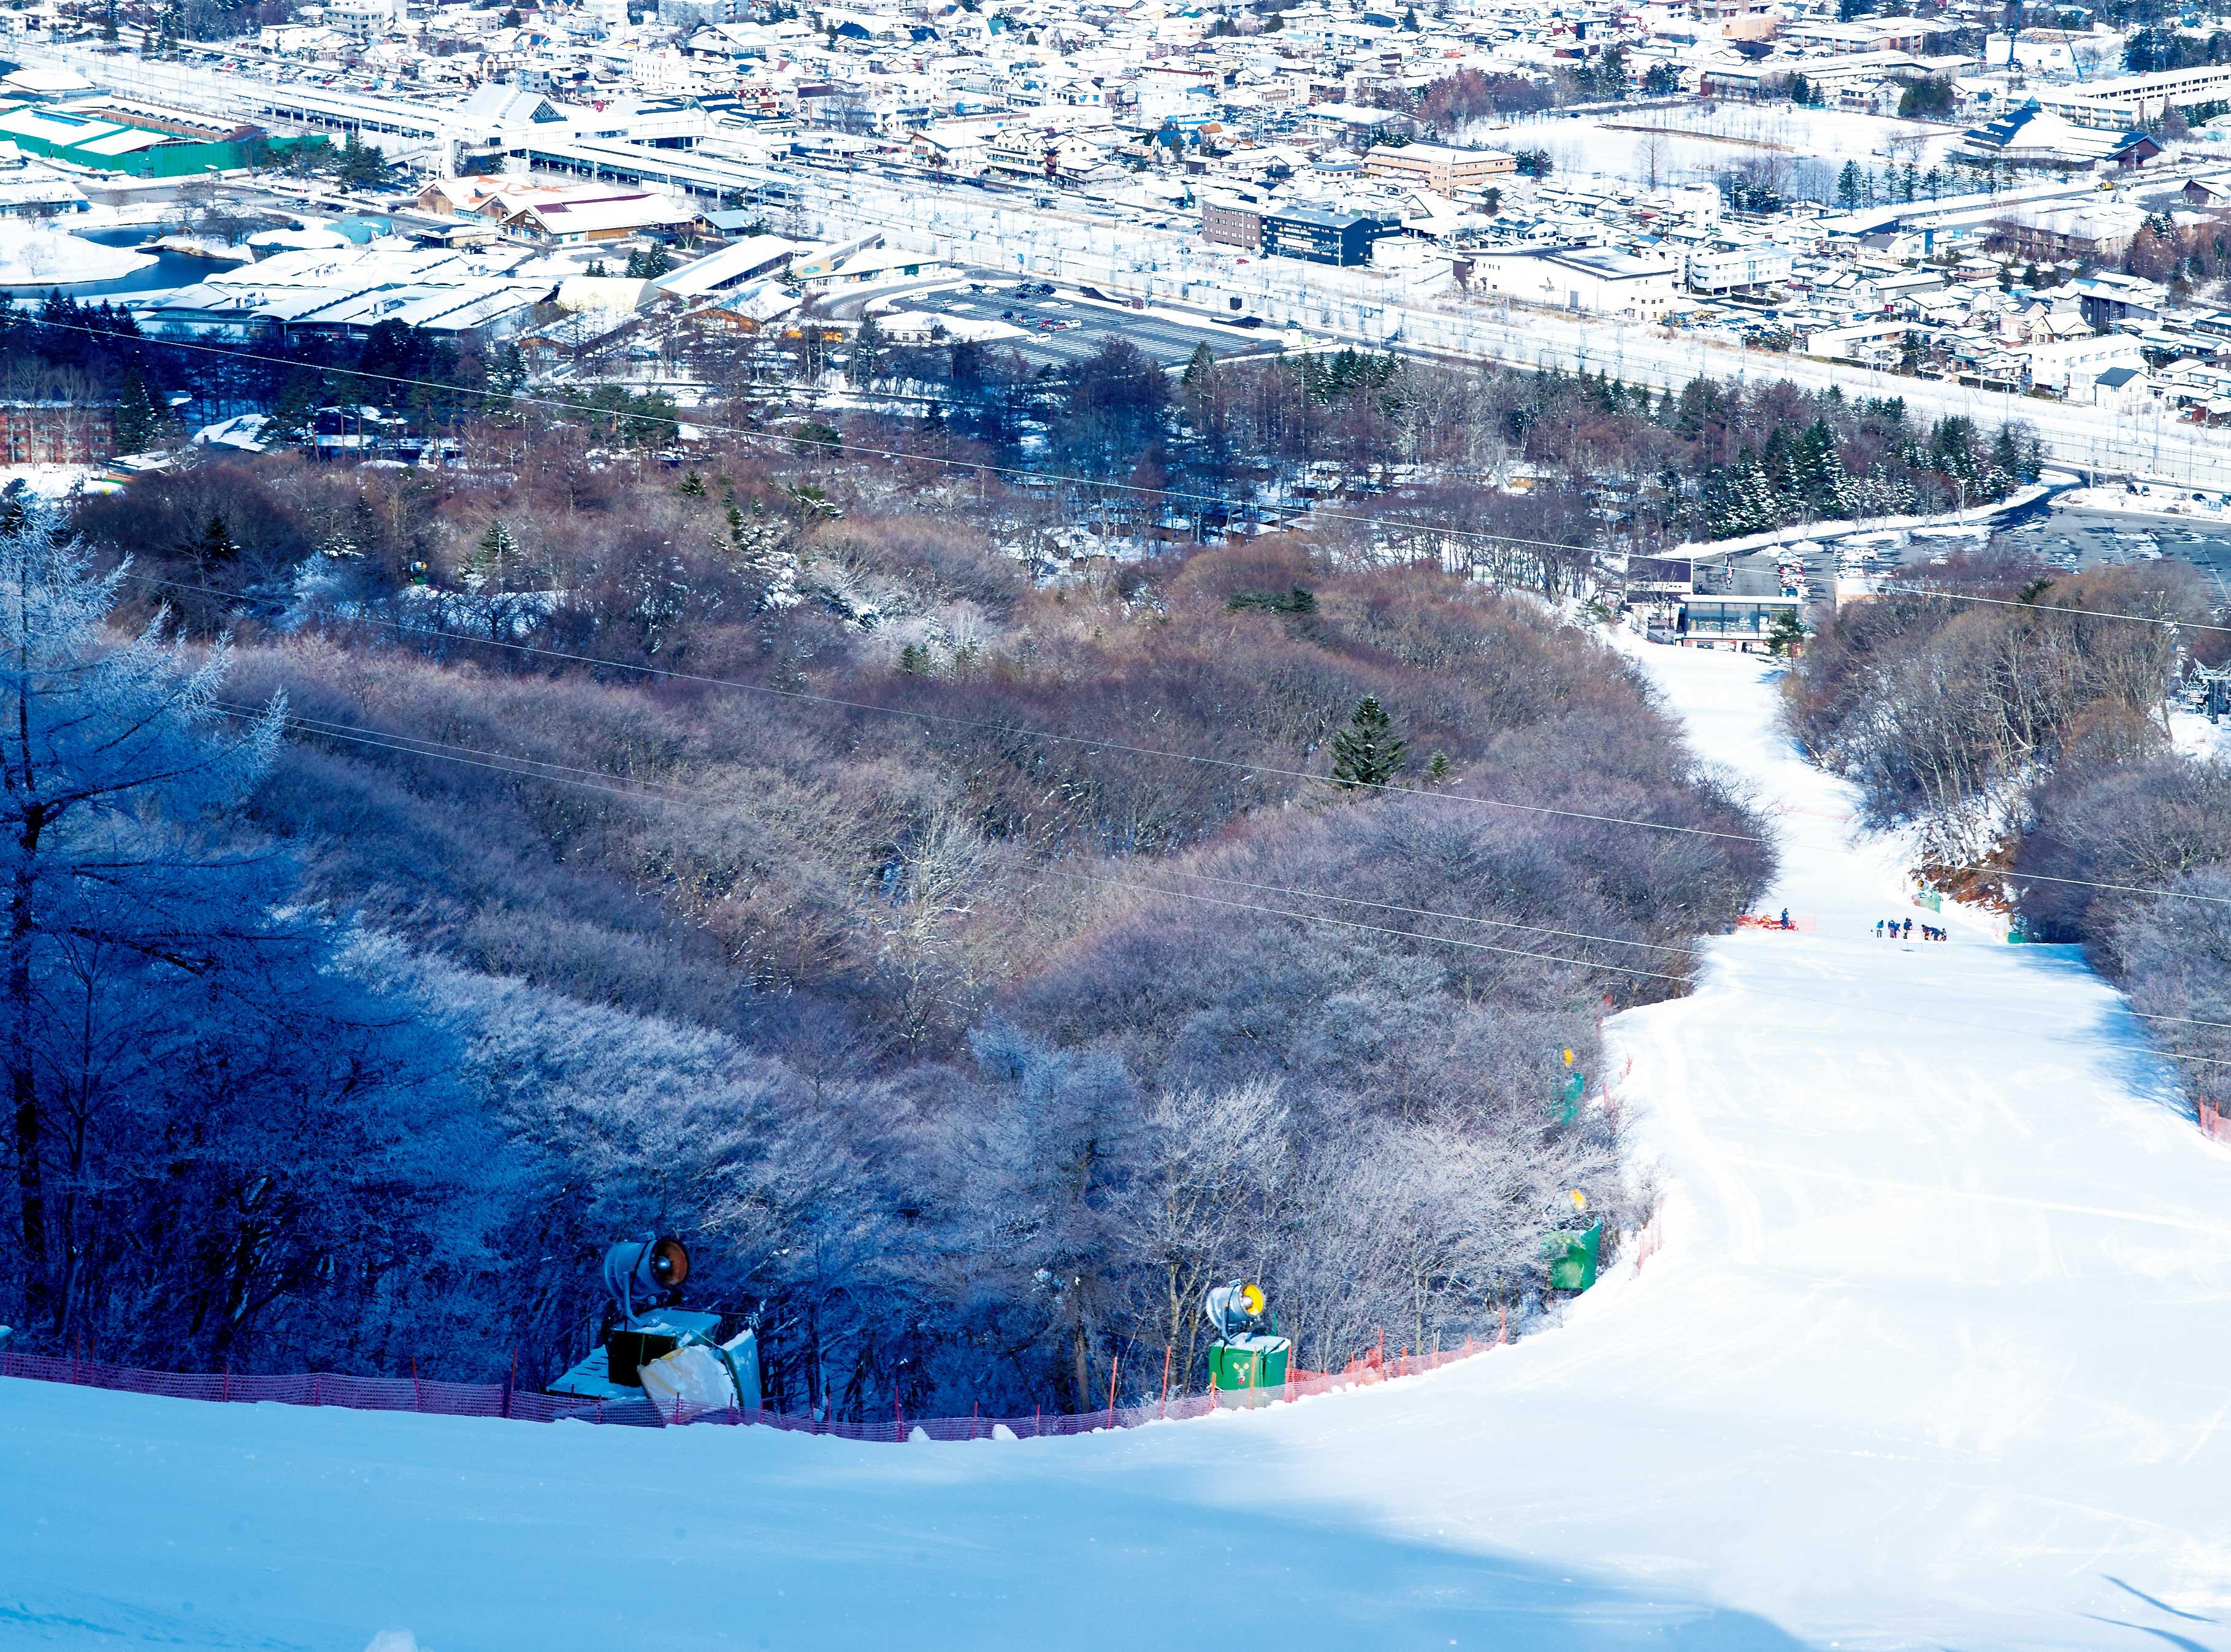 karuizawa|prince snow kids - prince hotels' snow resorts